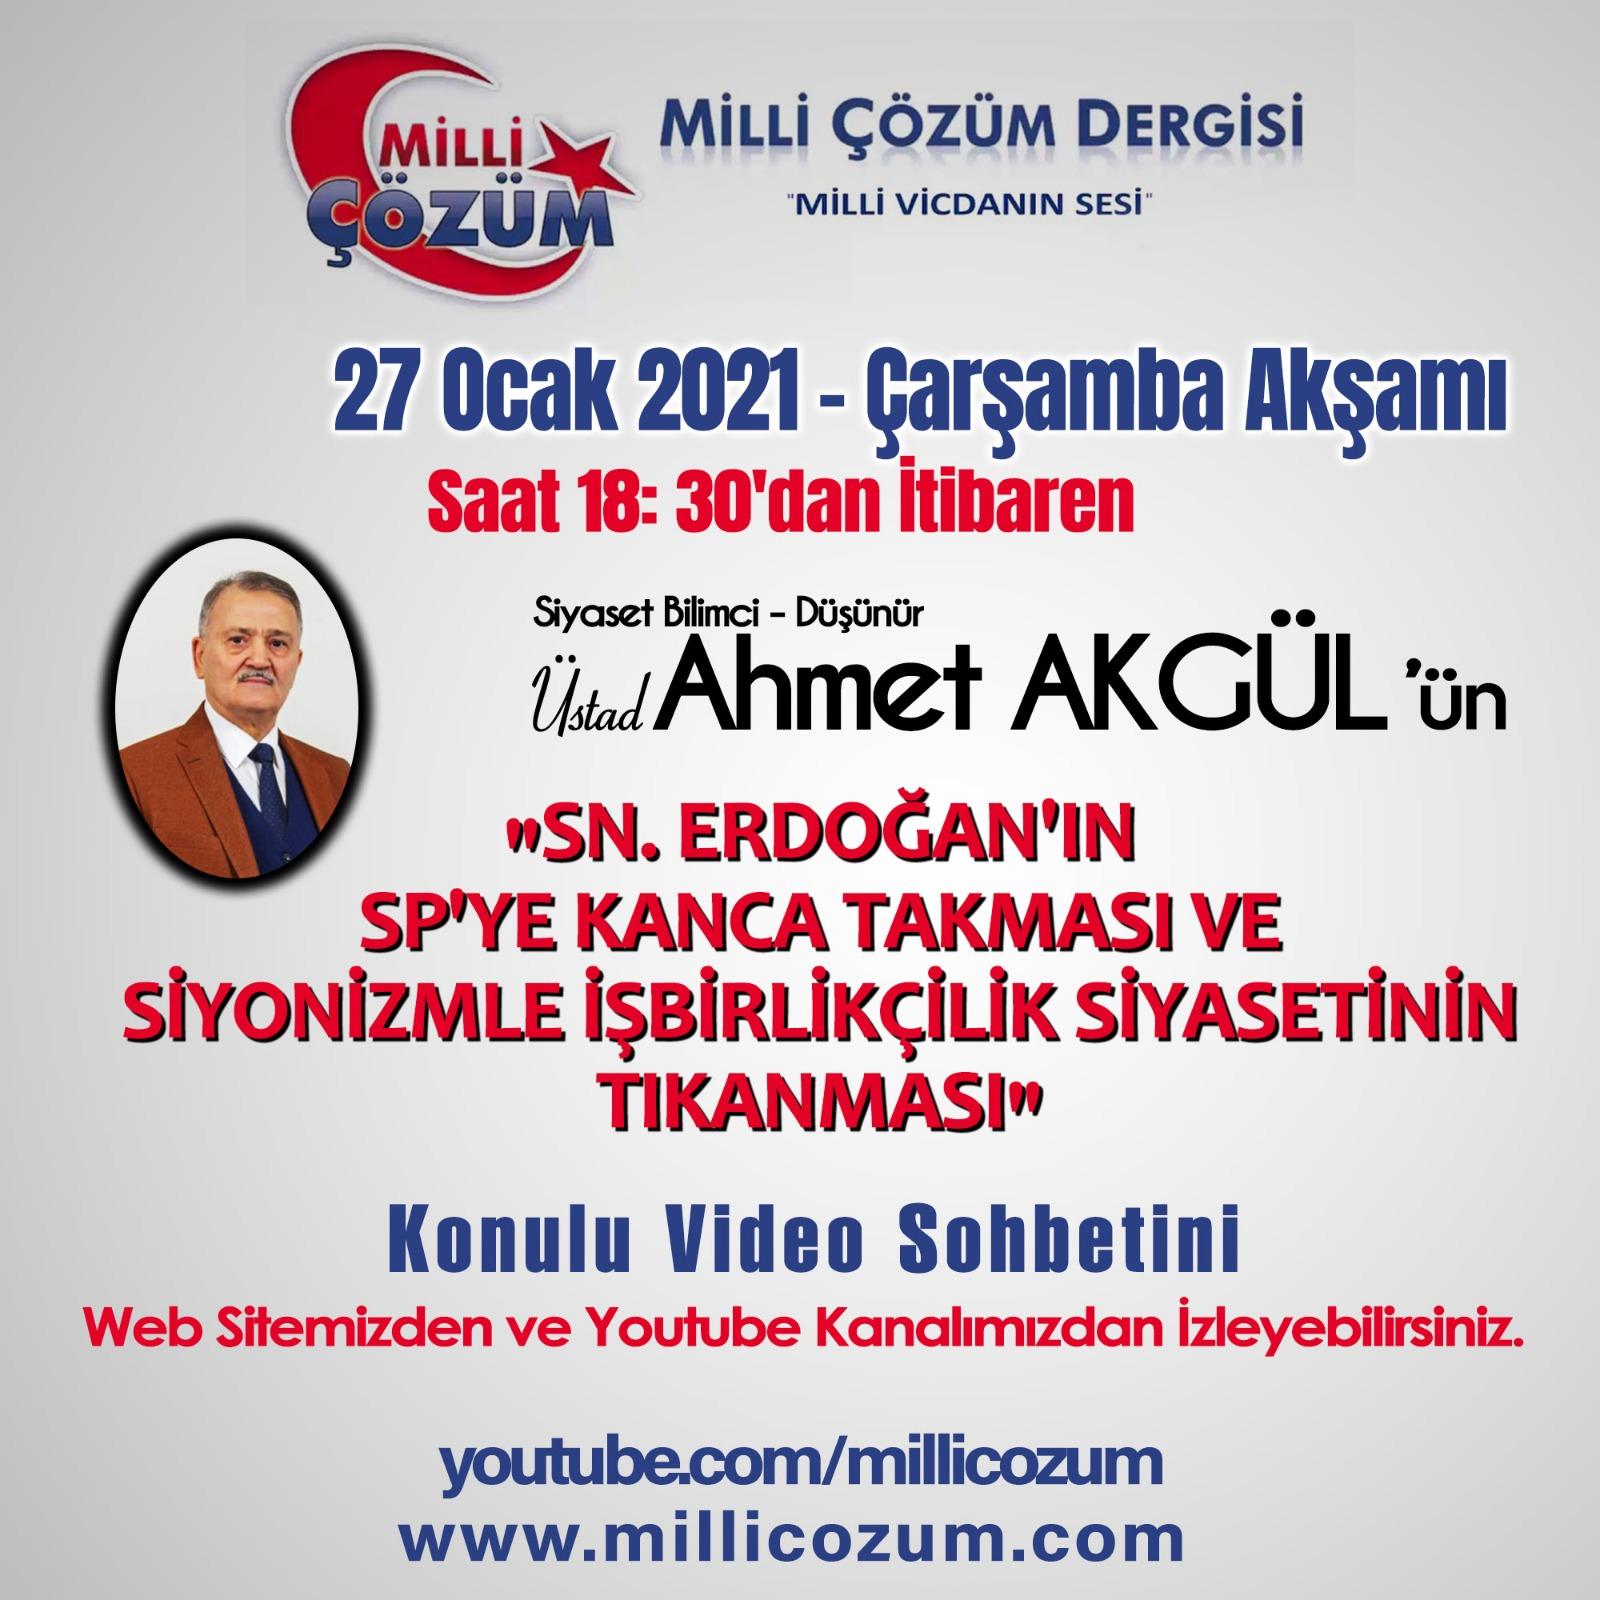 TARİHİ VİDEO SOHBETİNE DAVET!